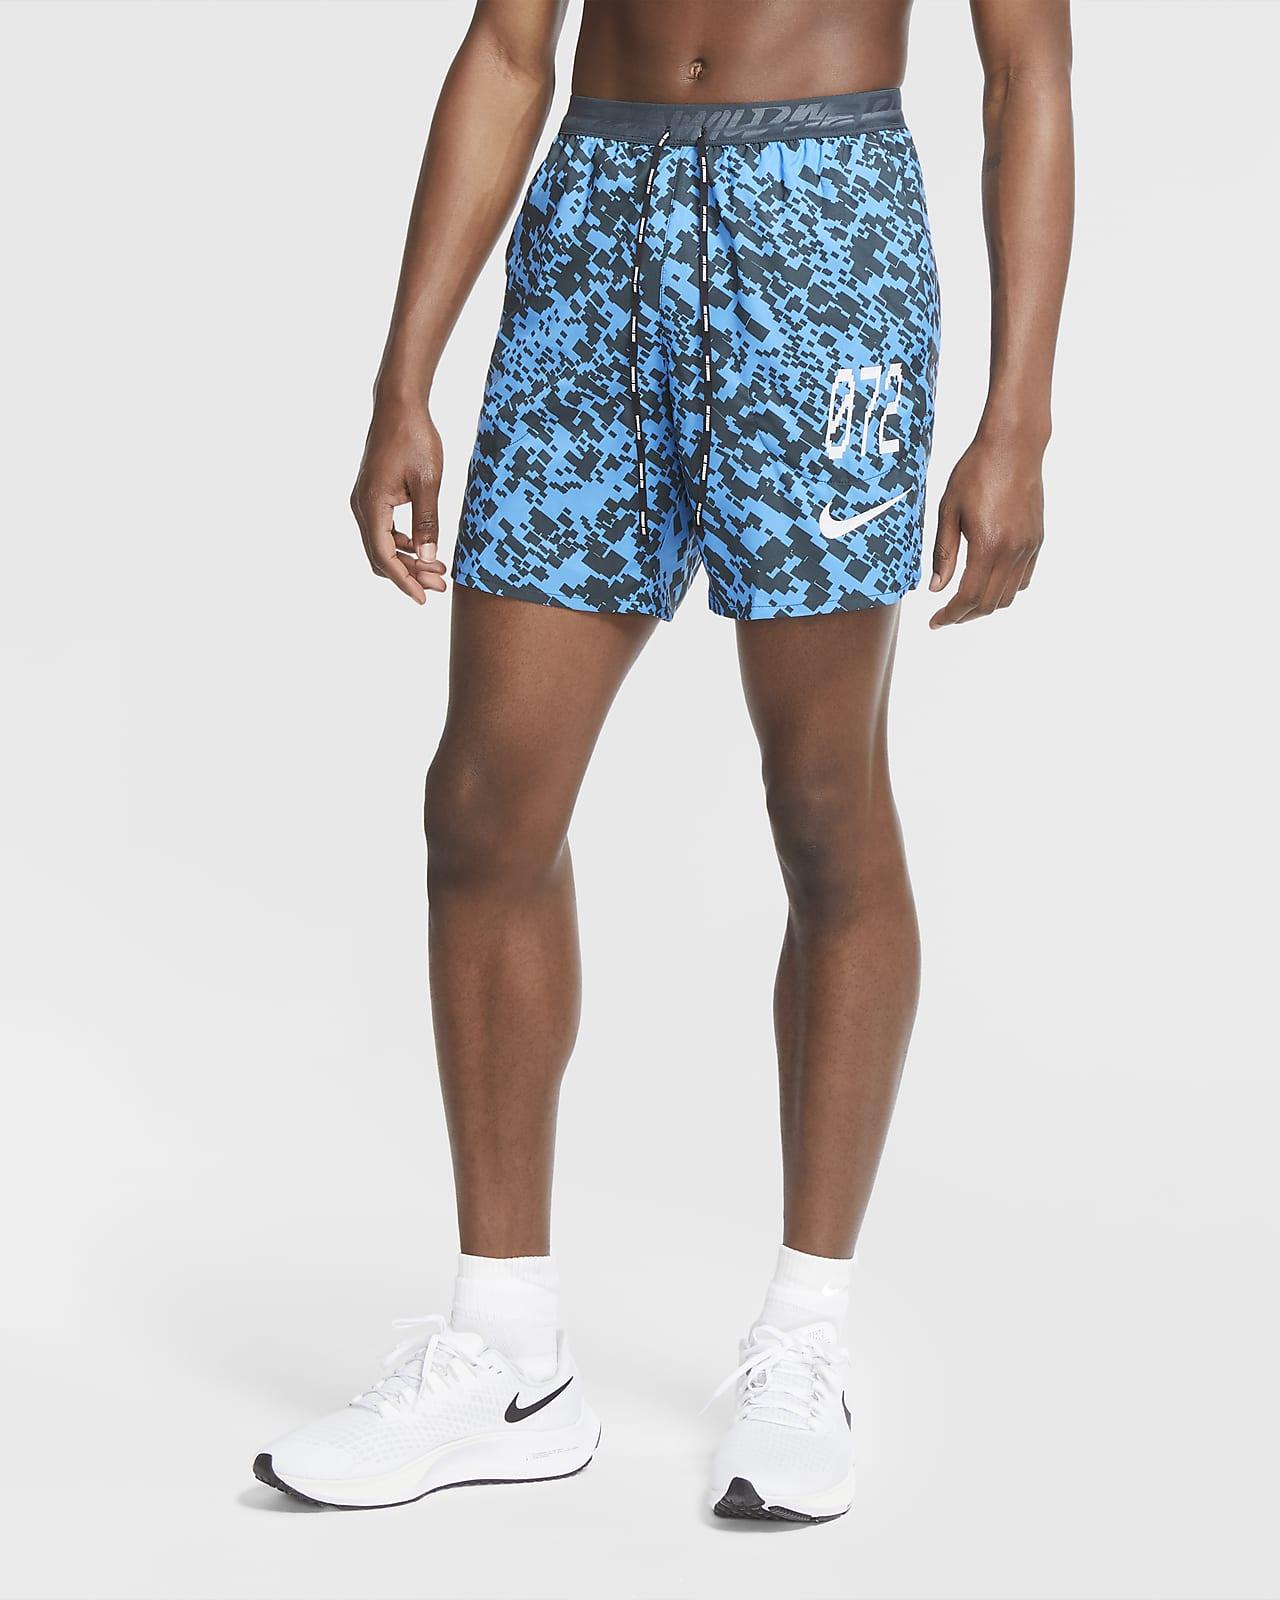 Nike Stride Wild Run 男款無襯裡跑步短褲